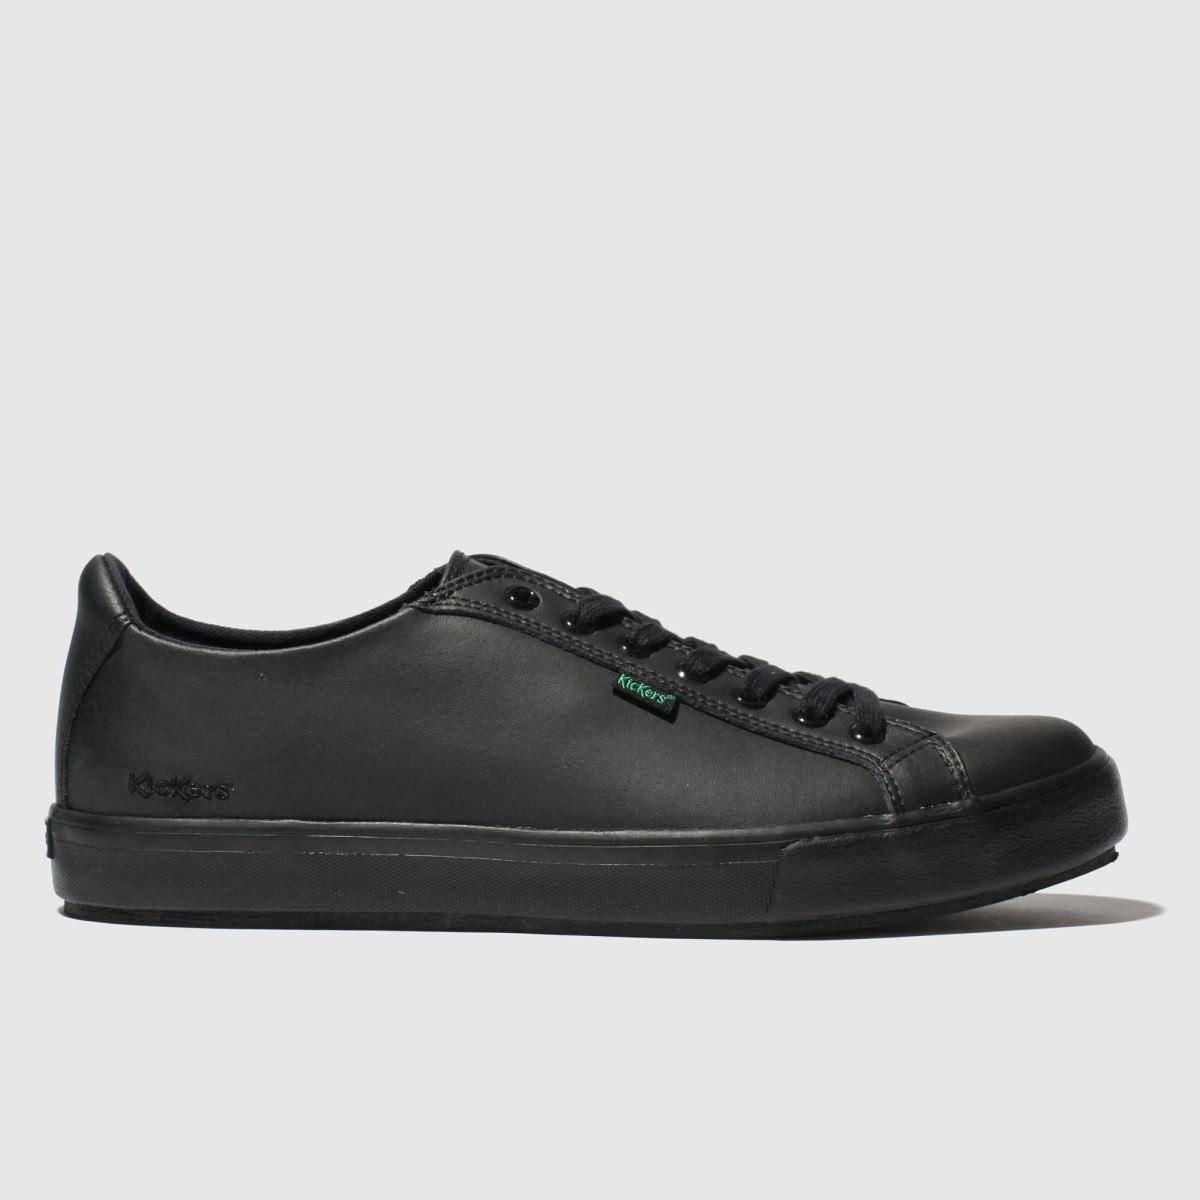 Kickers Black Tovni Lacer Shoes